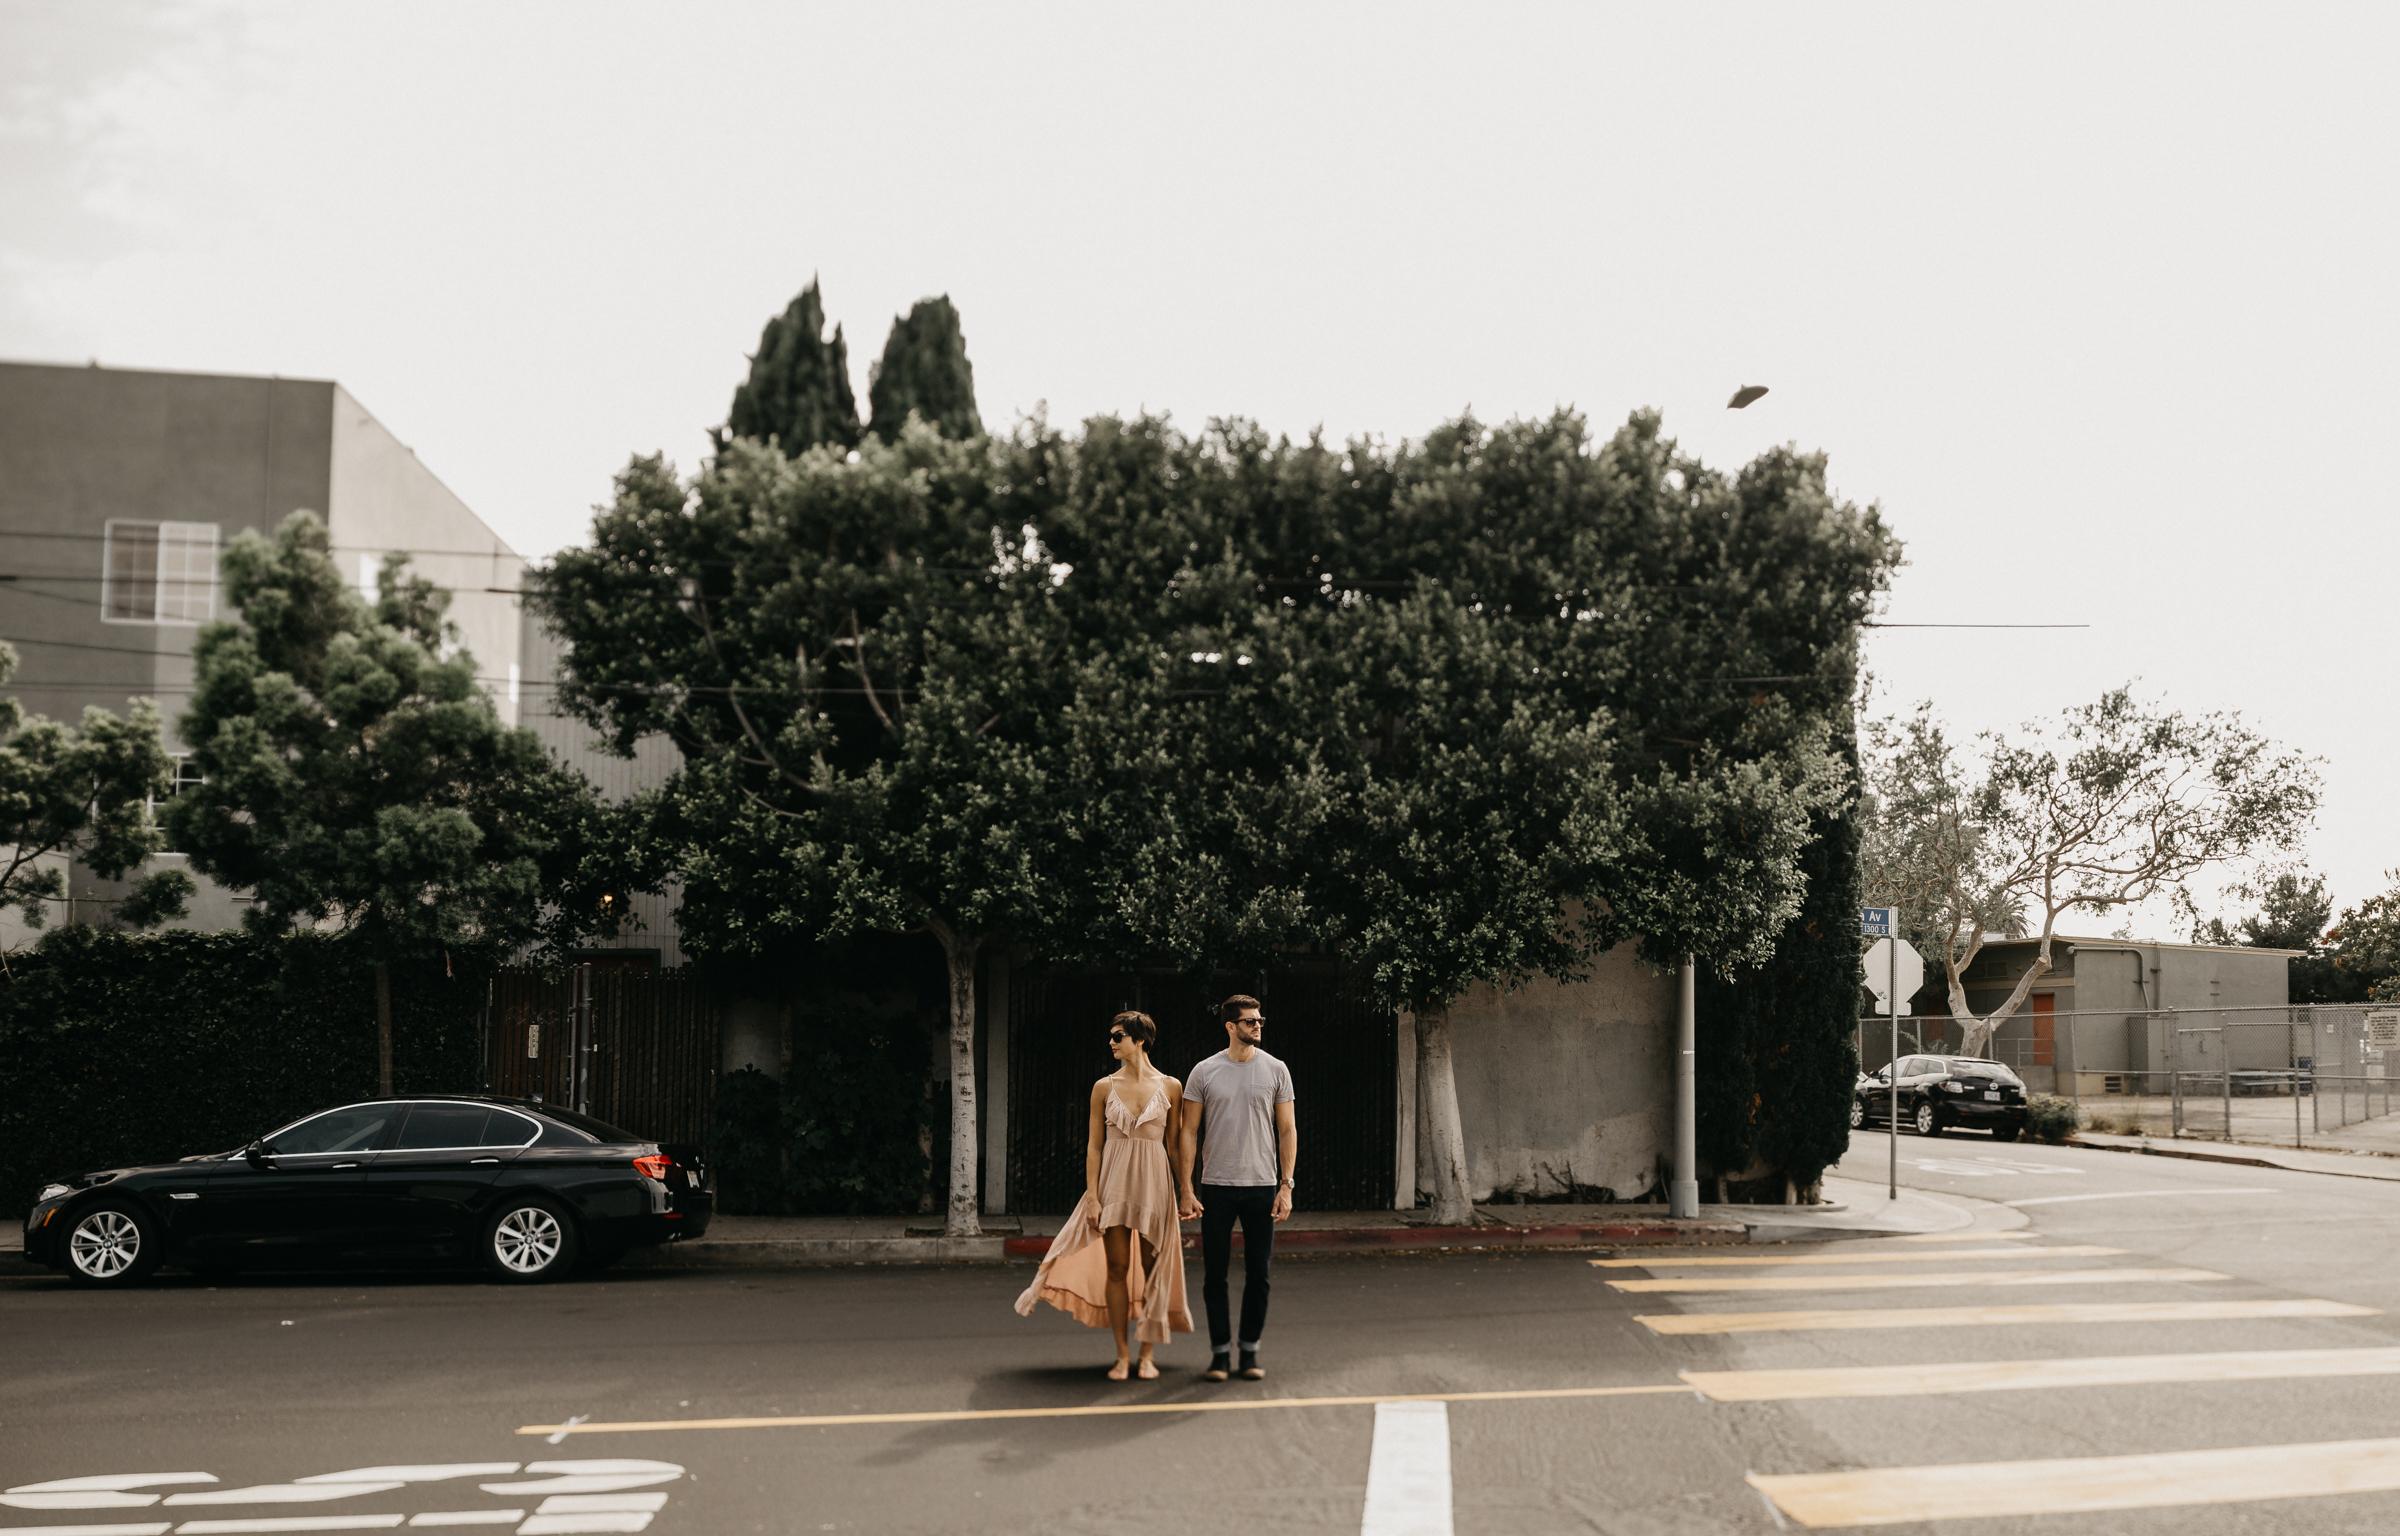 Isaiah + Taylor Photography - Venice Beach & Santa Monica Engagement Session, Los Angeles Wedding Photographer-036.jpg